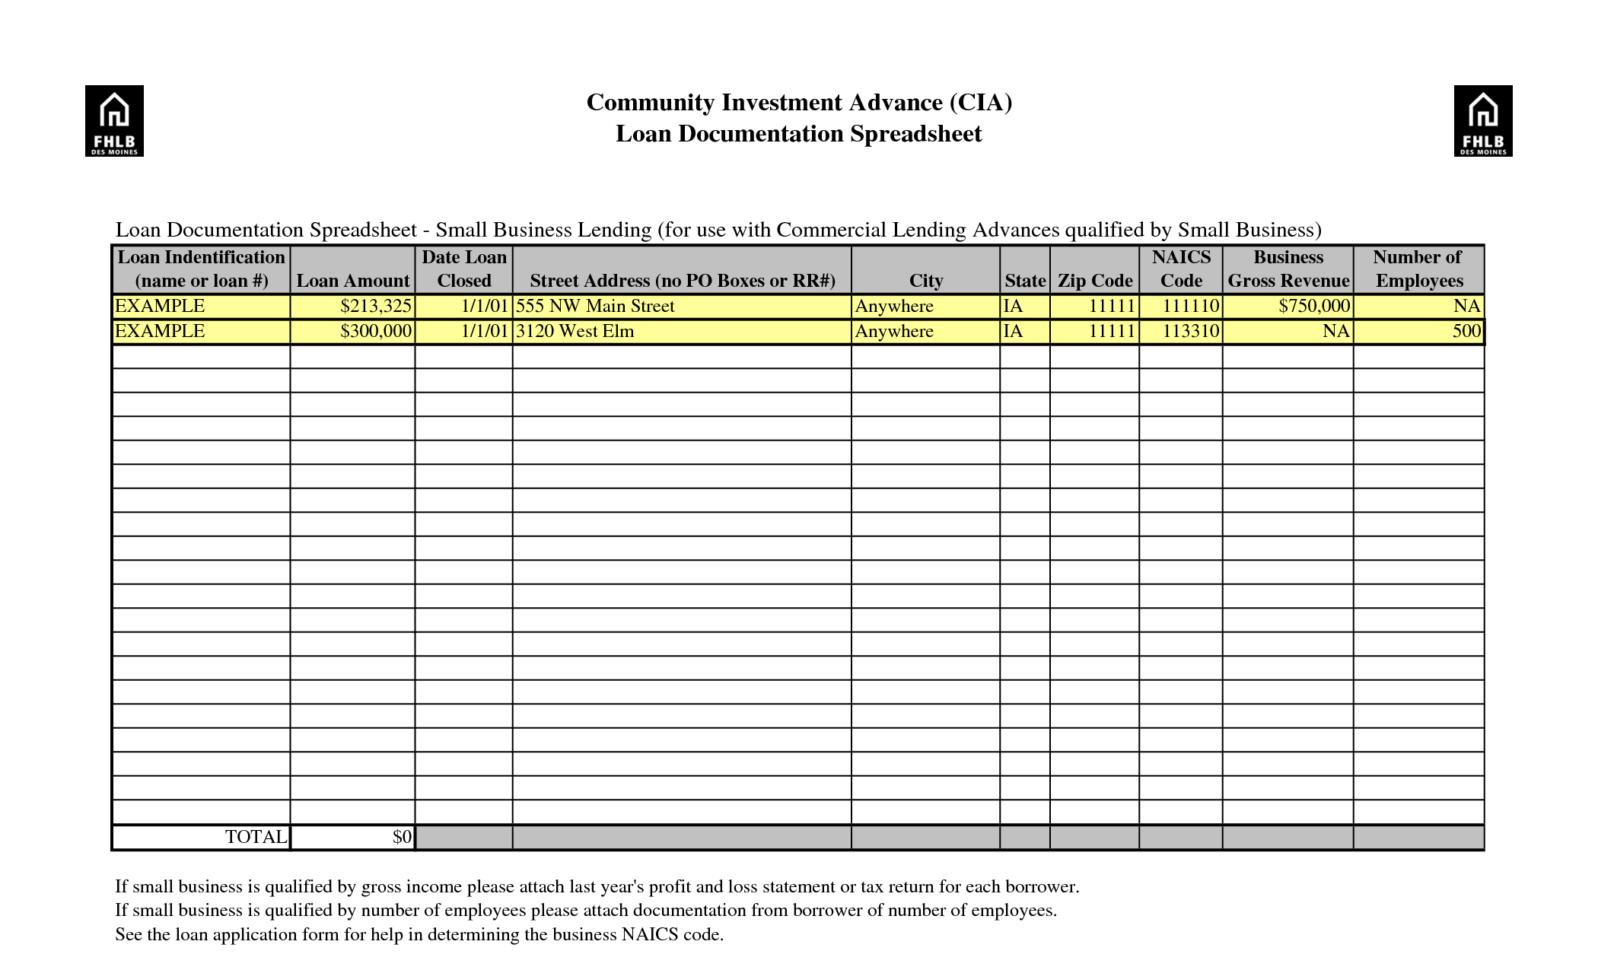 Expense Revenue Spreadsheet Intended For Business Expense Tracker Template 6 Tracking Expenses Spreadsheet